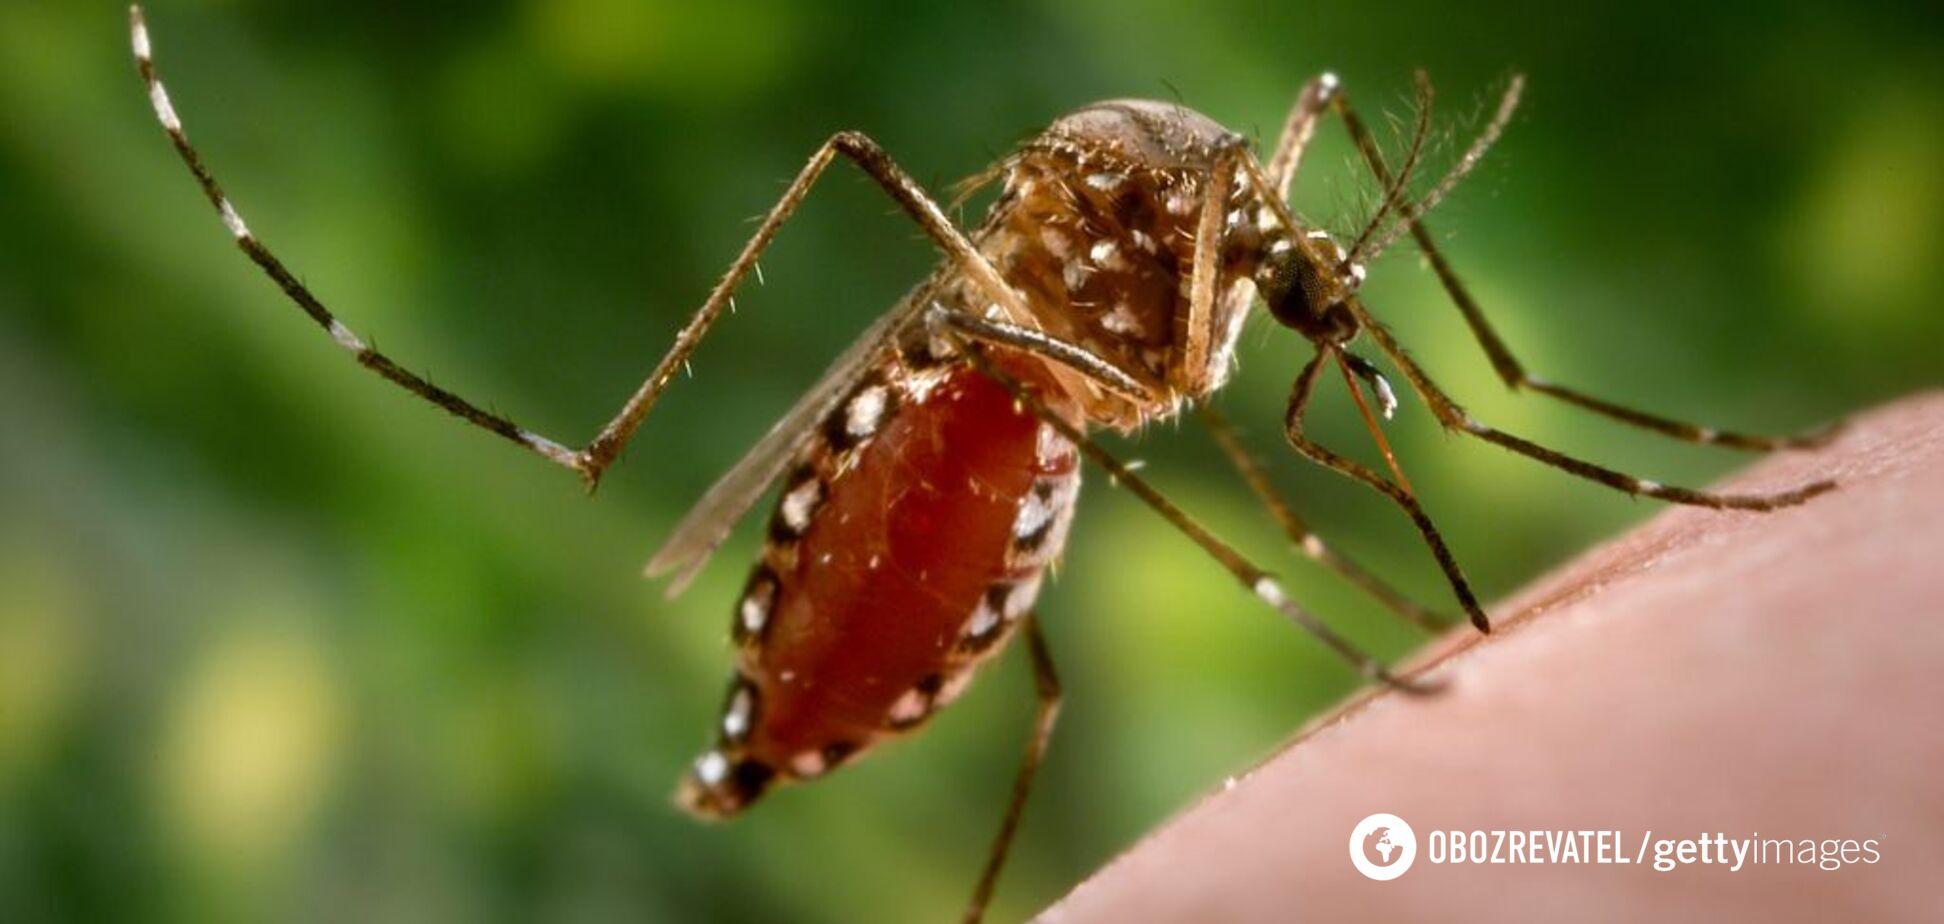 Комары переносят лихорадку зика, вирус денге: медик предупредила об опасности